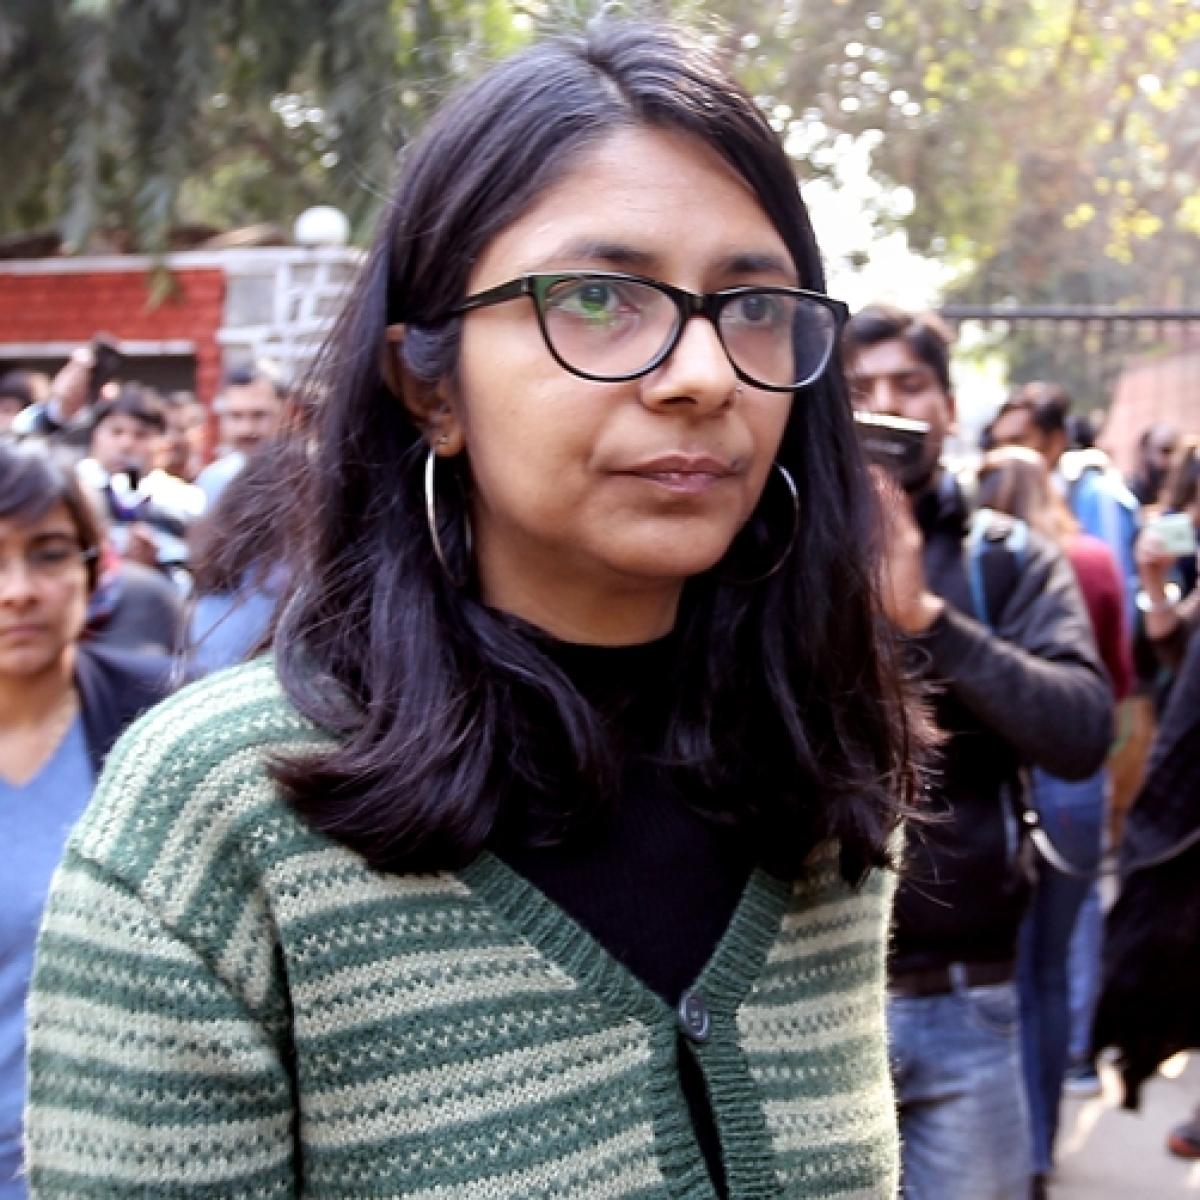 Why is arrest Swati Maliwal trending?